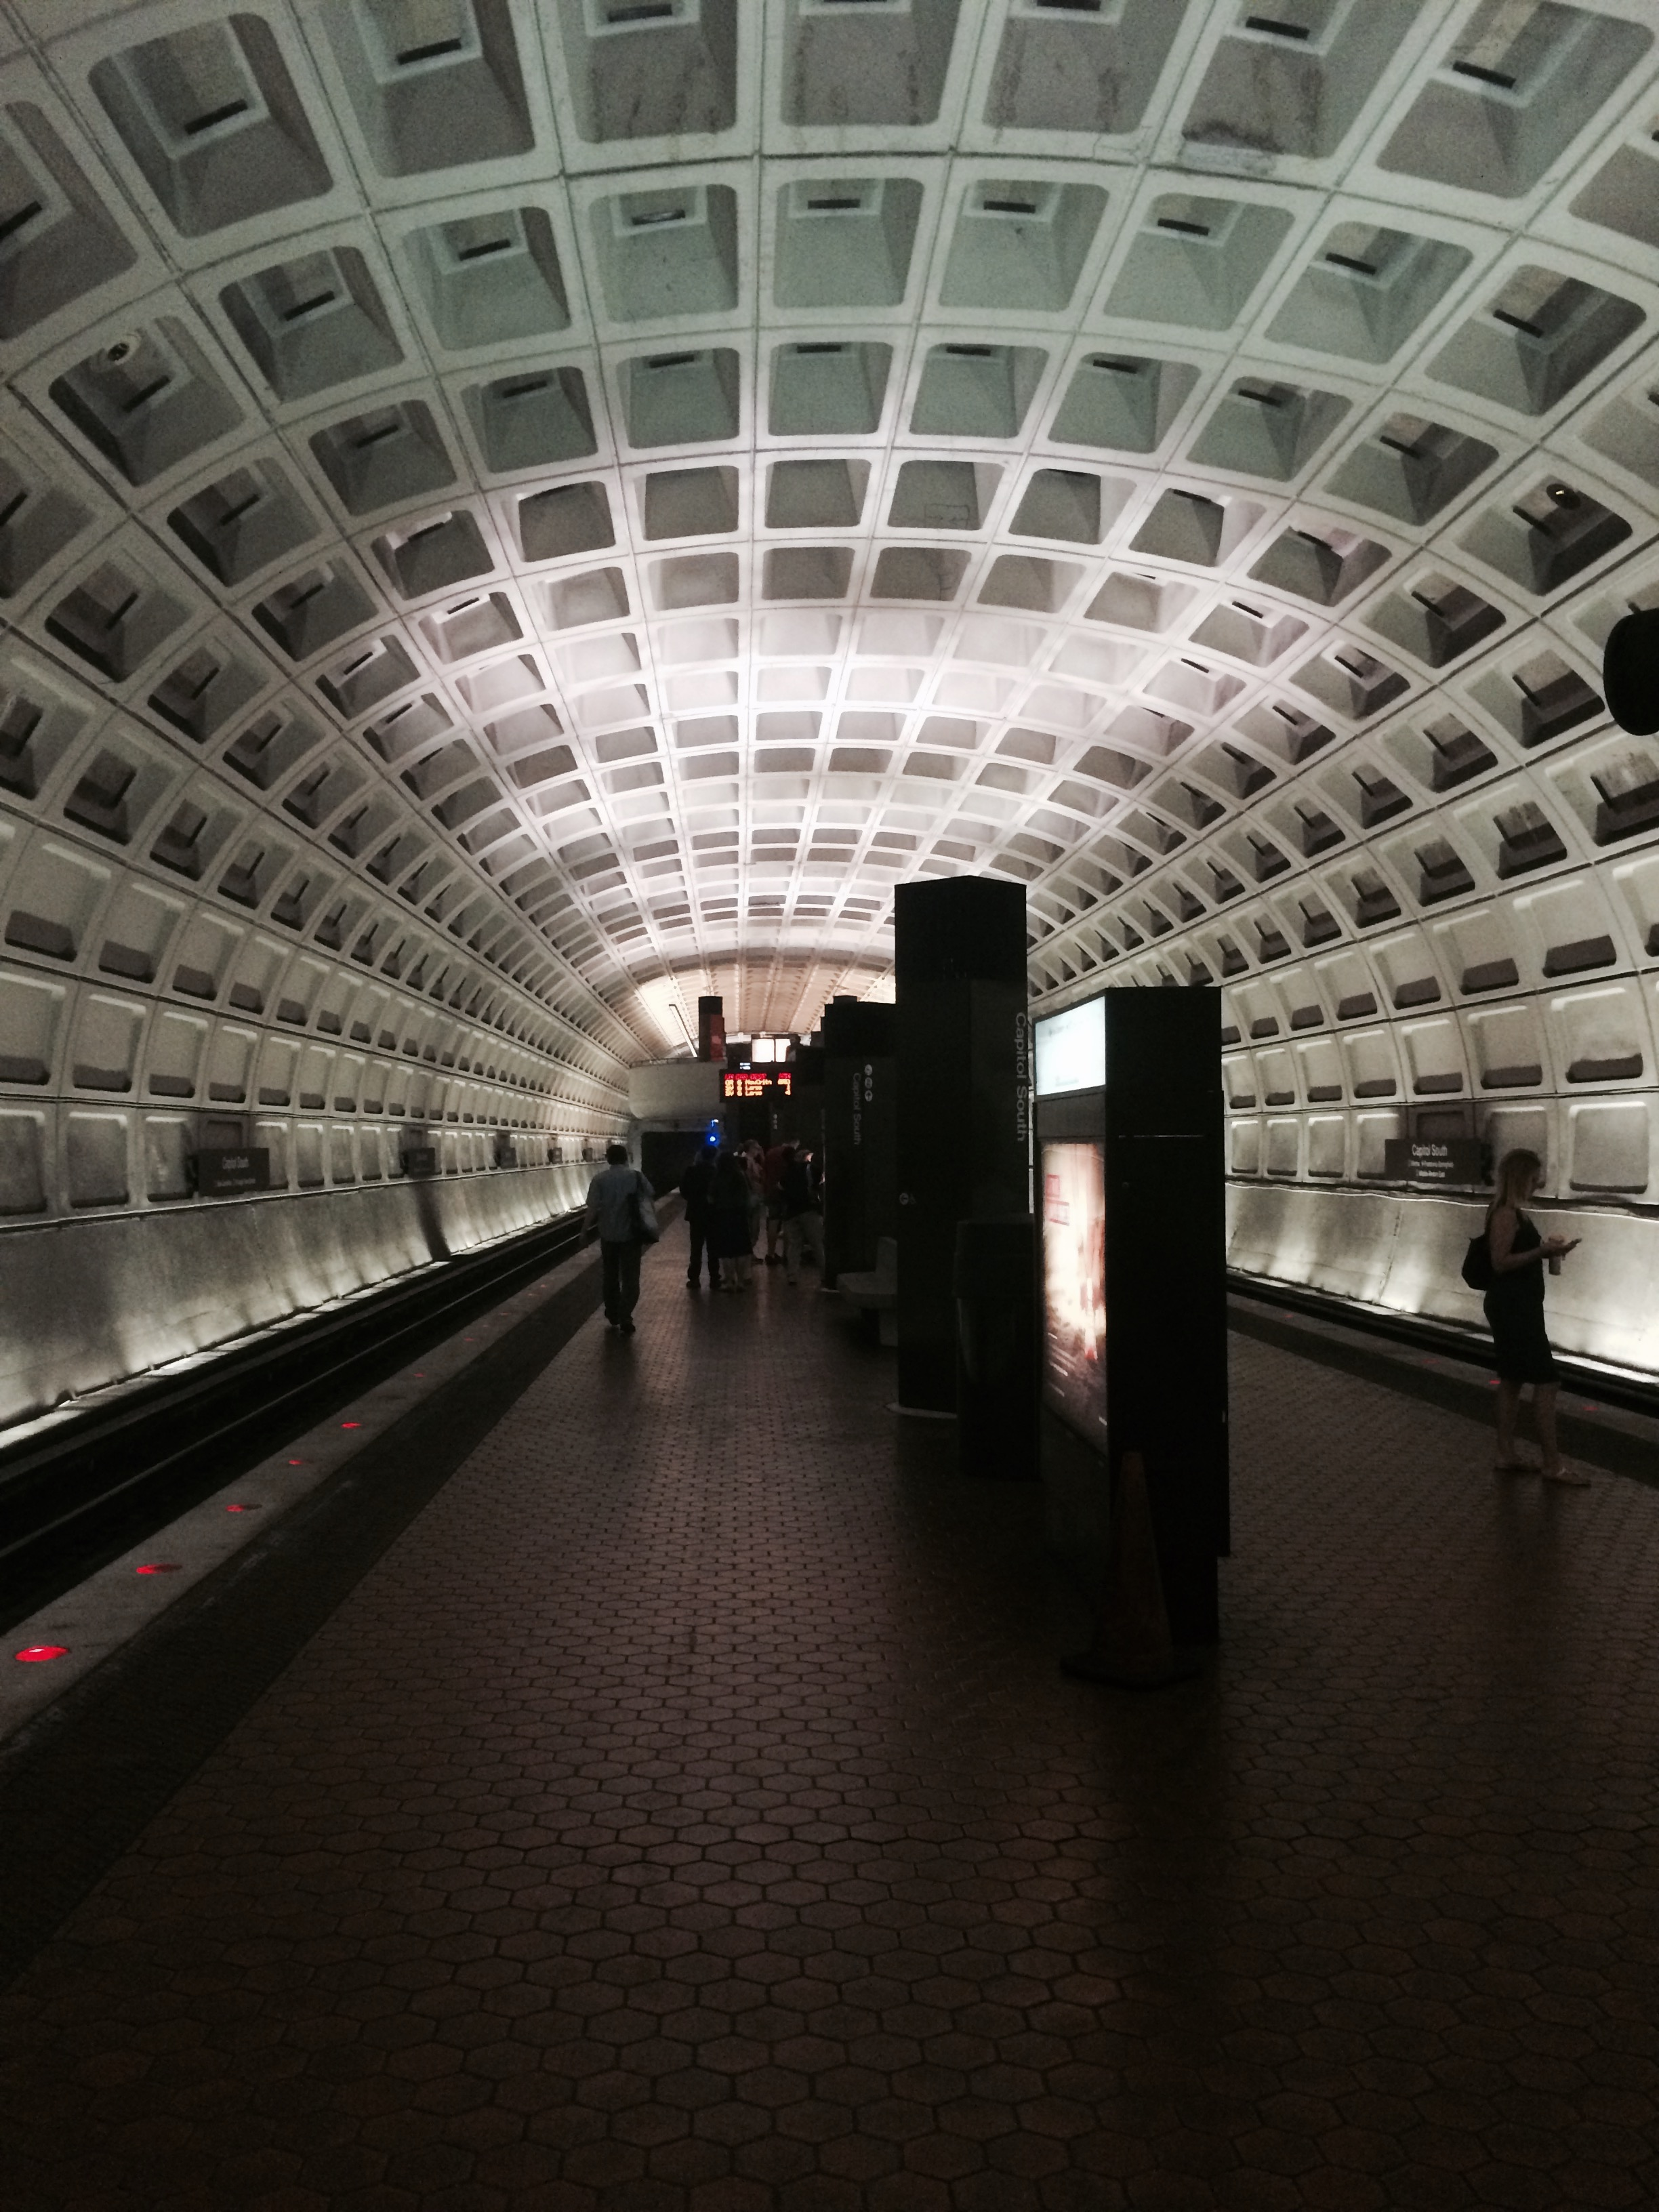 фото метро в Вашингтоне